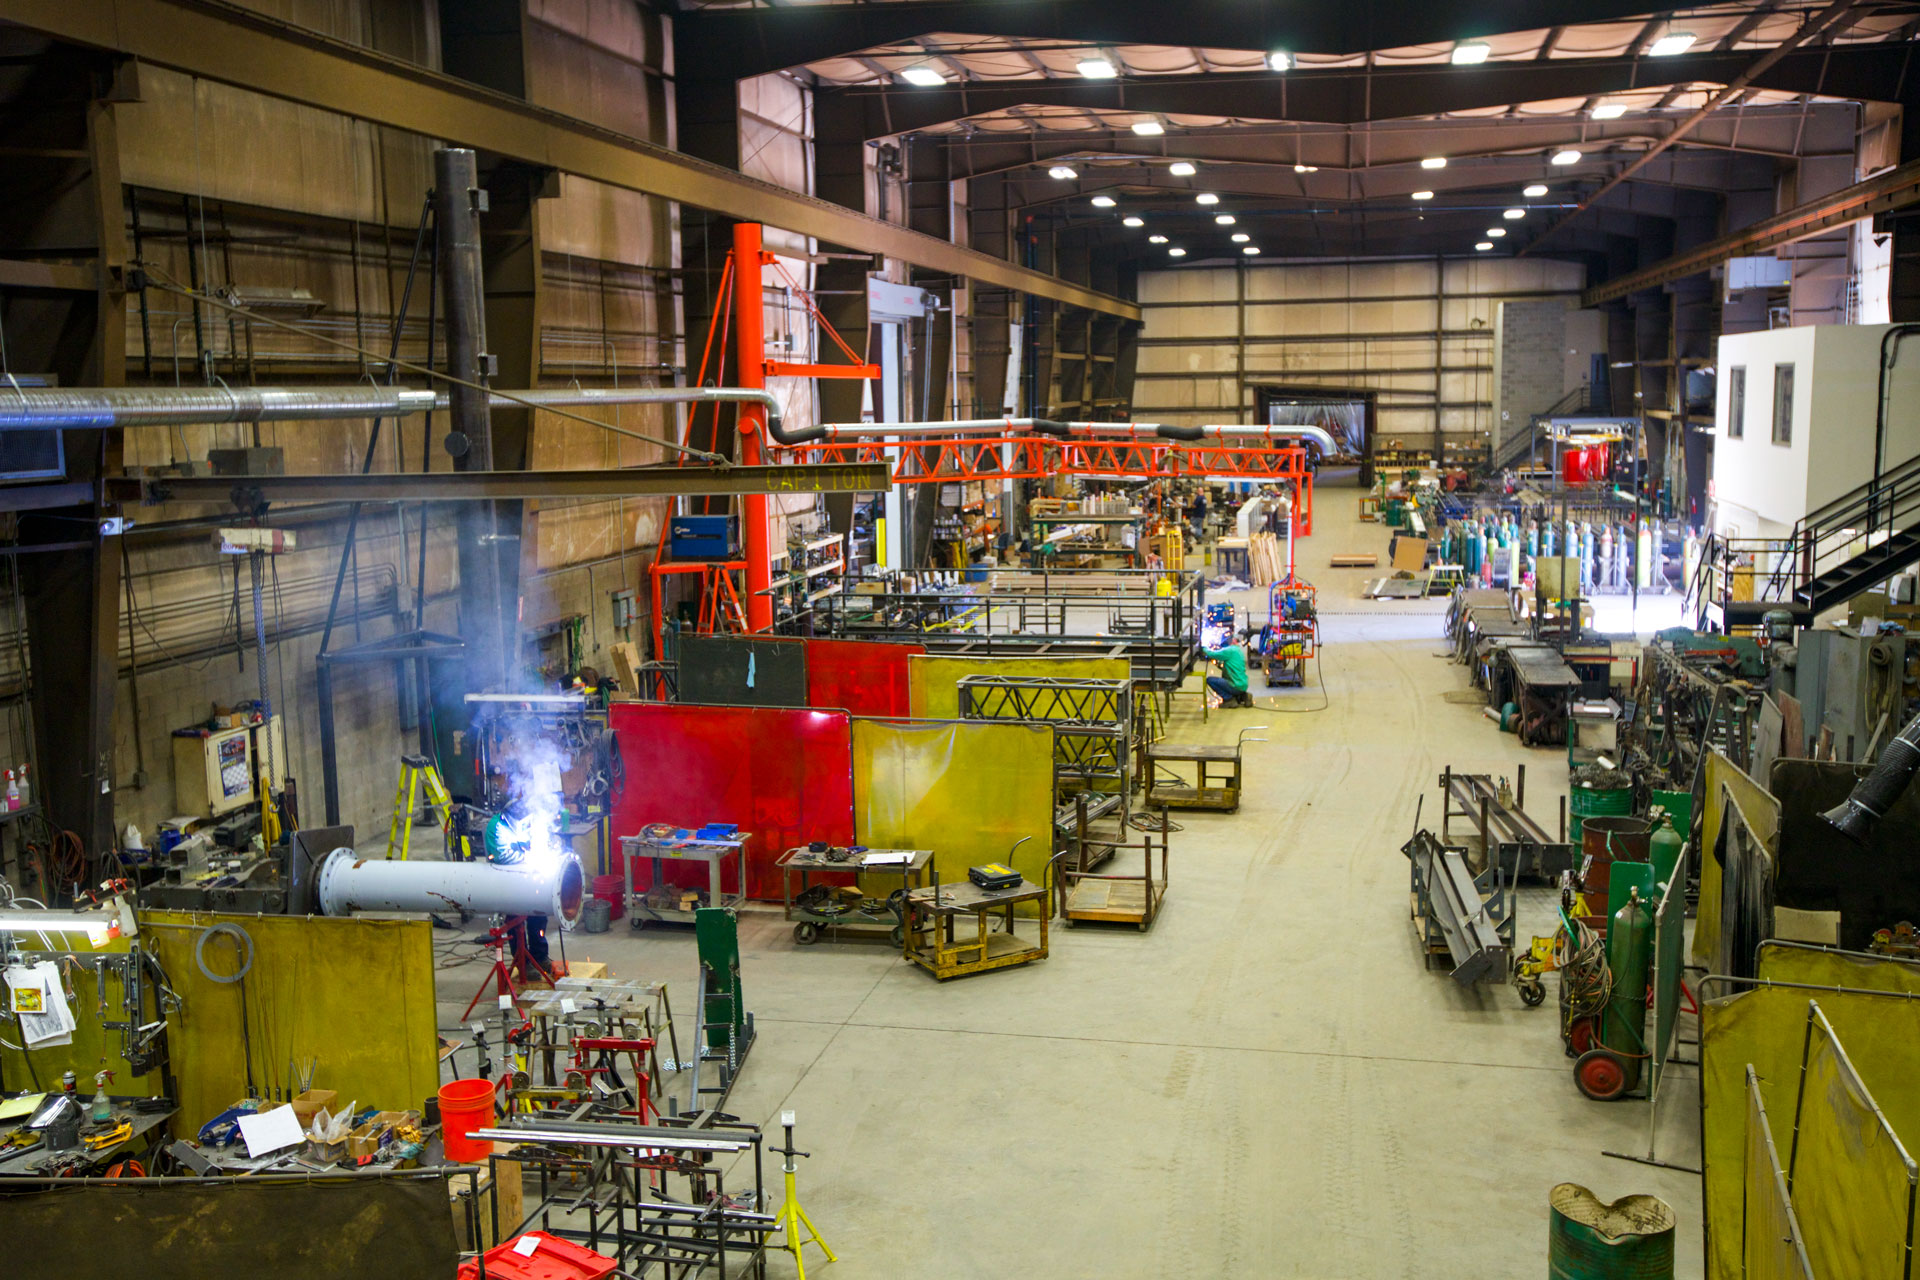 Wm. T. Spaeder Fabrication Facility